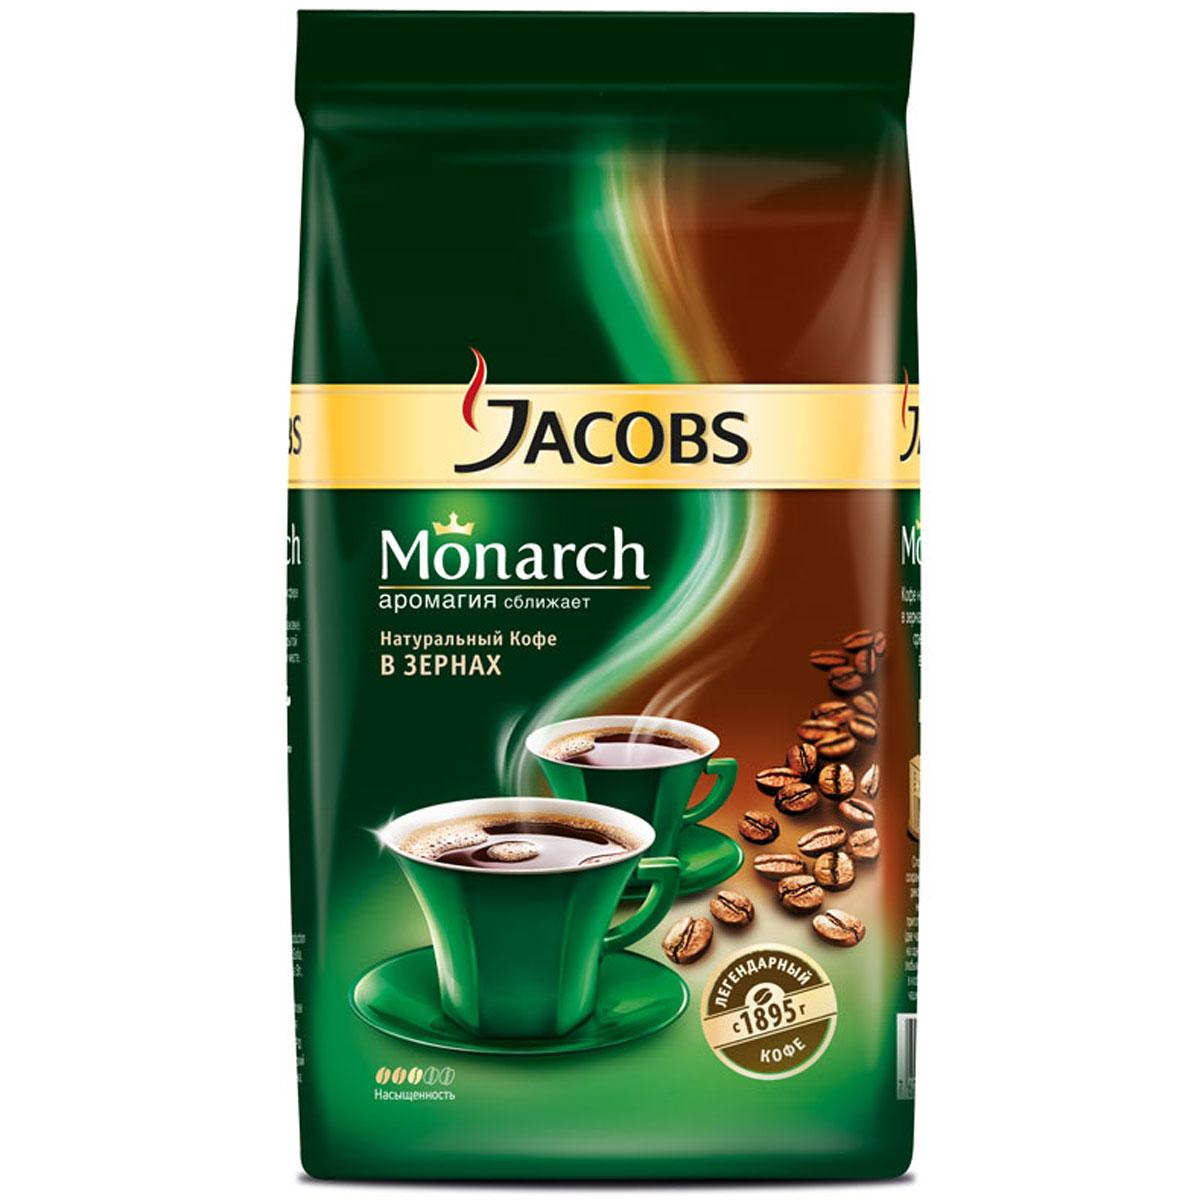 Jacobs Monarch кофе в зернах, 250 г